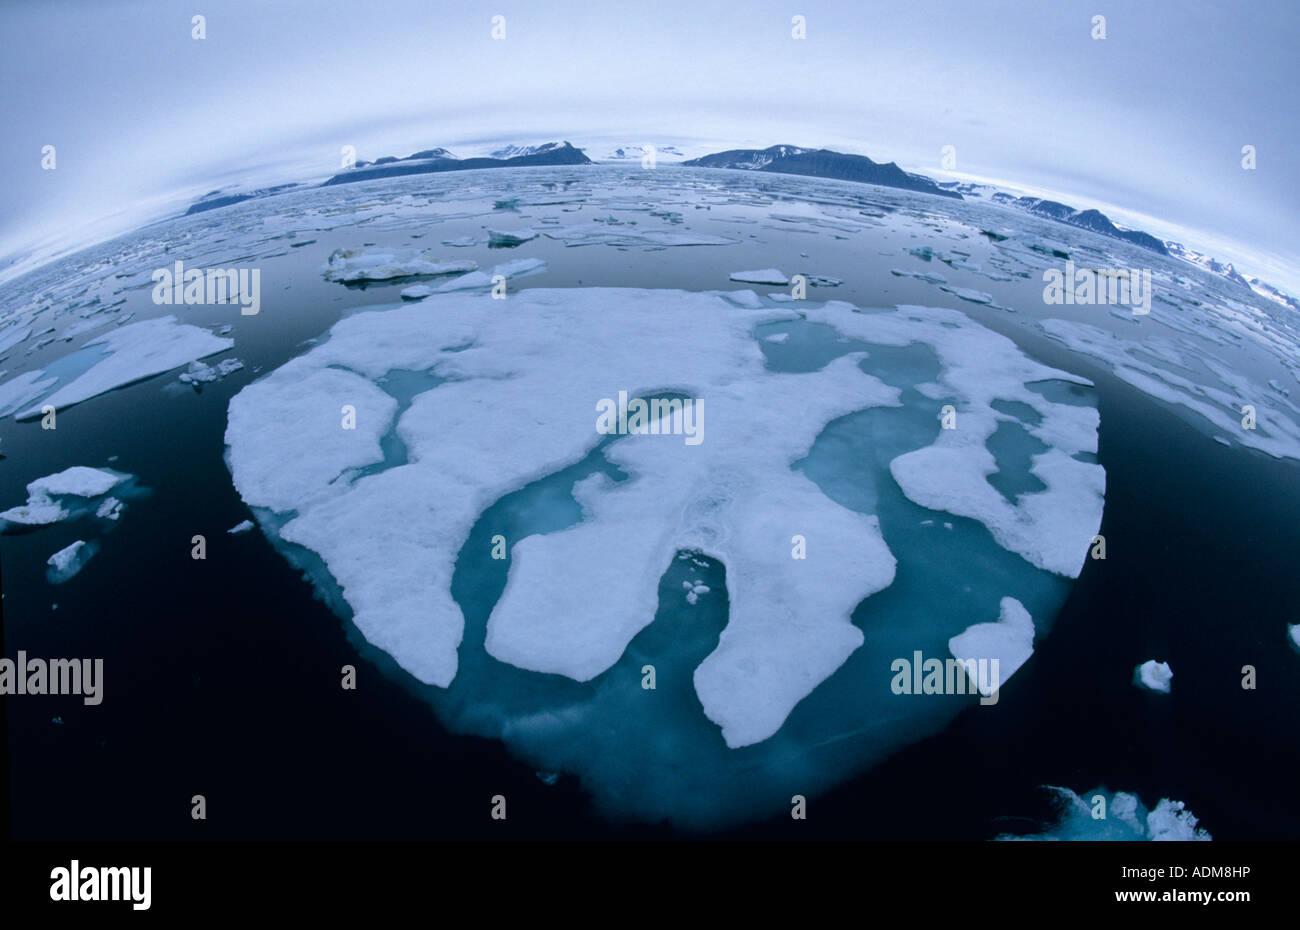 La Norvège, Svalbard, banquise arctique, Spitzberg, objectif Fisheye Photo Stock